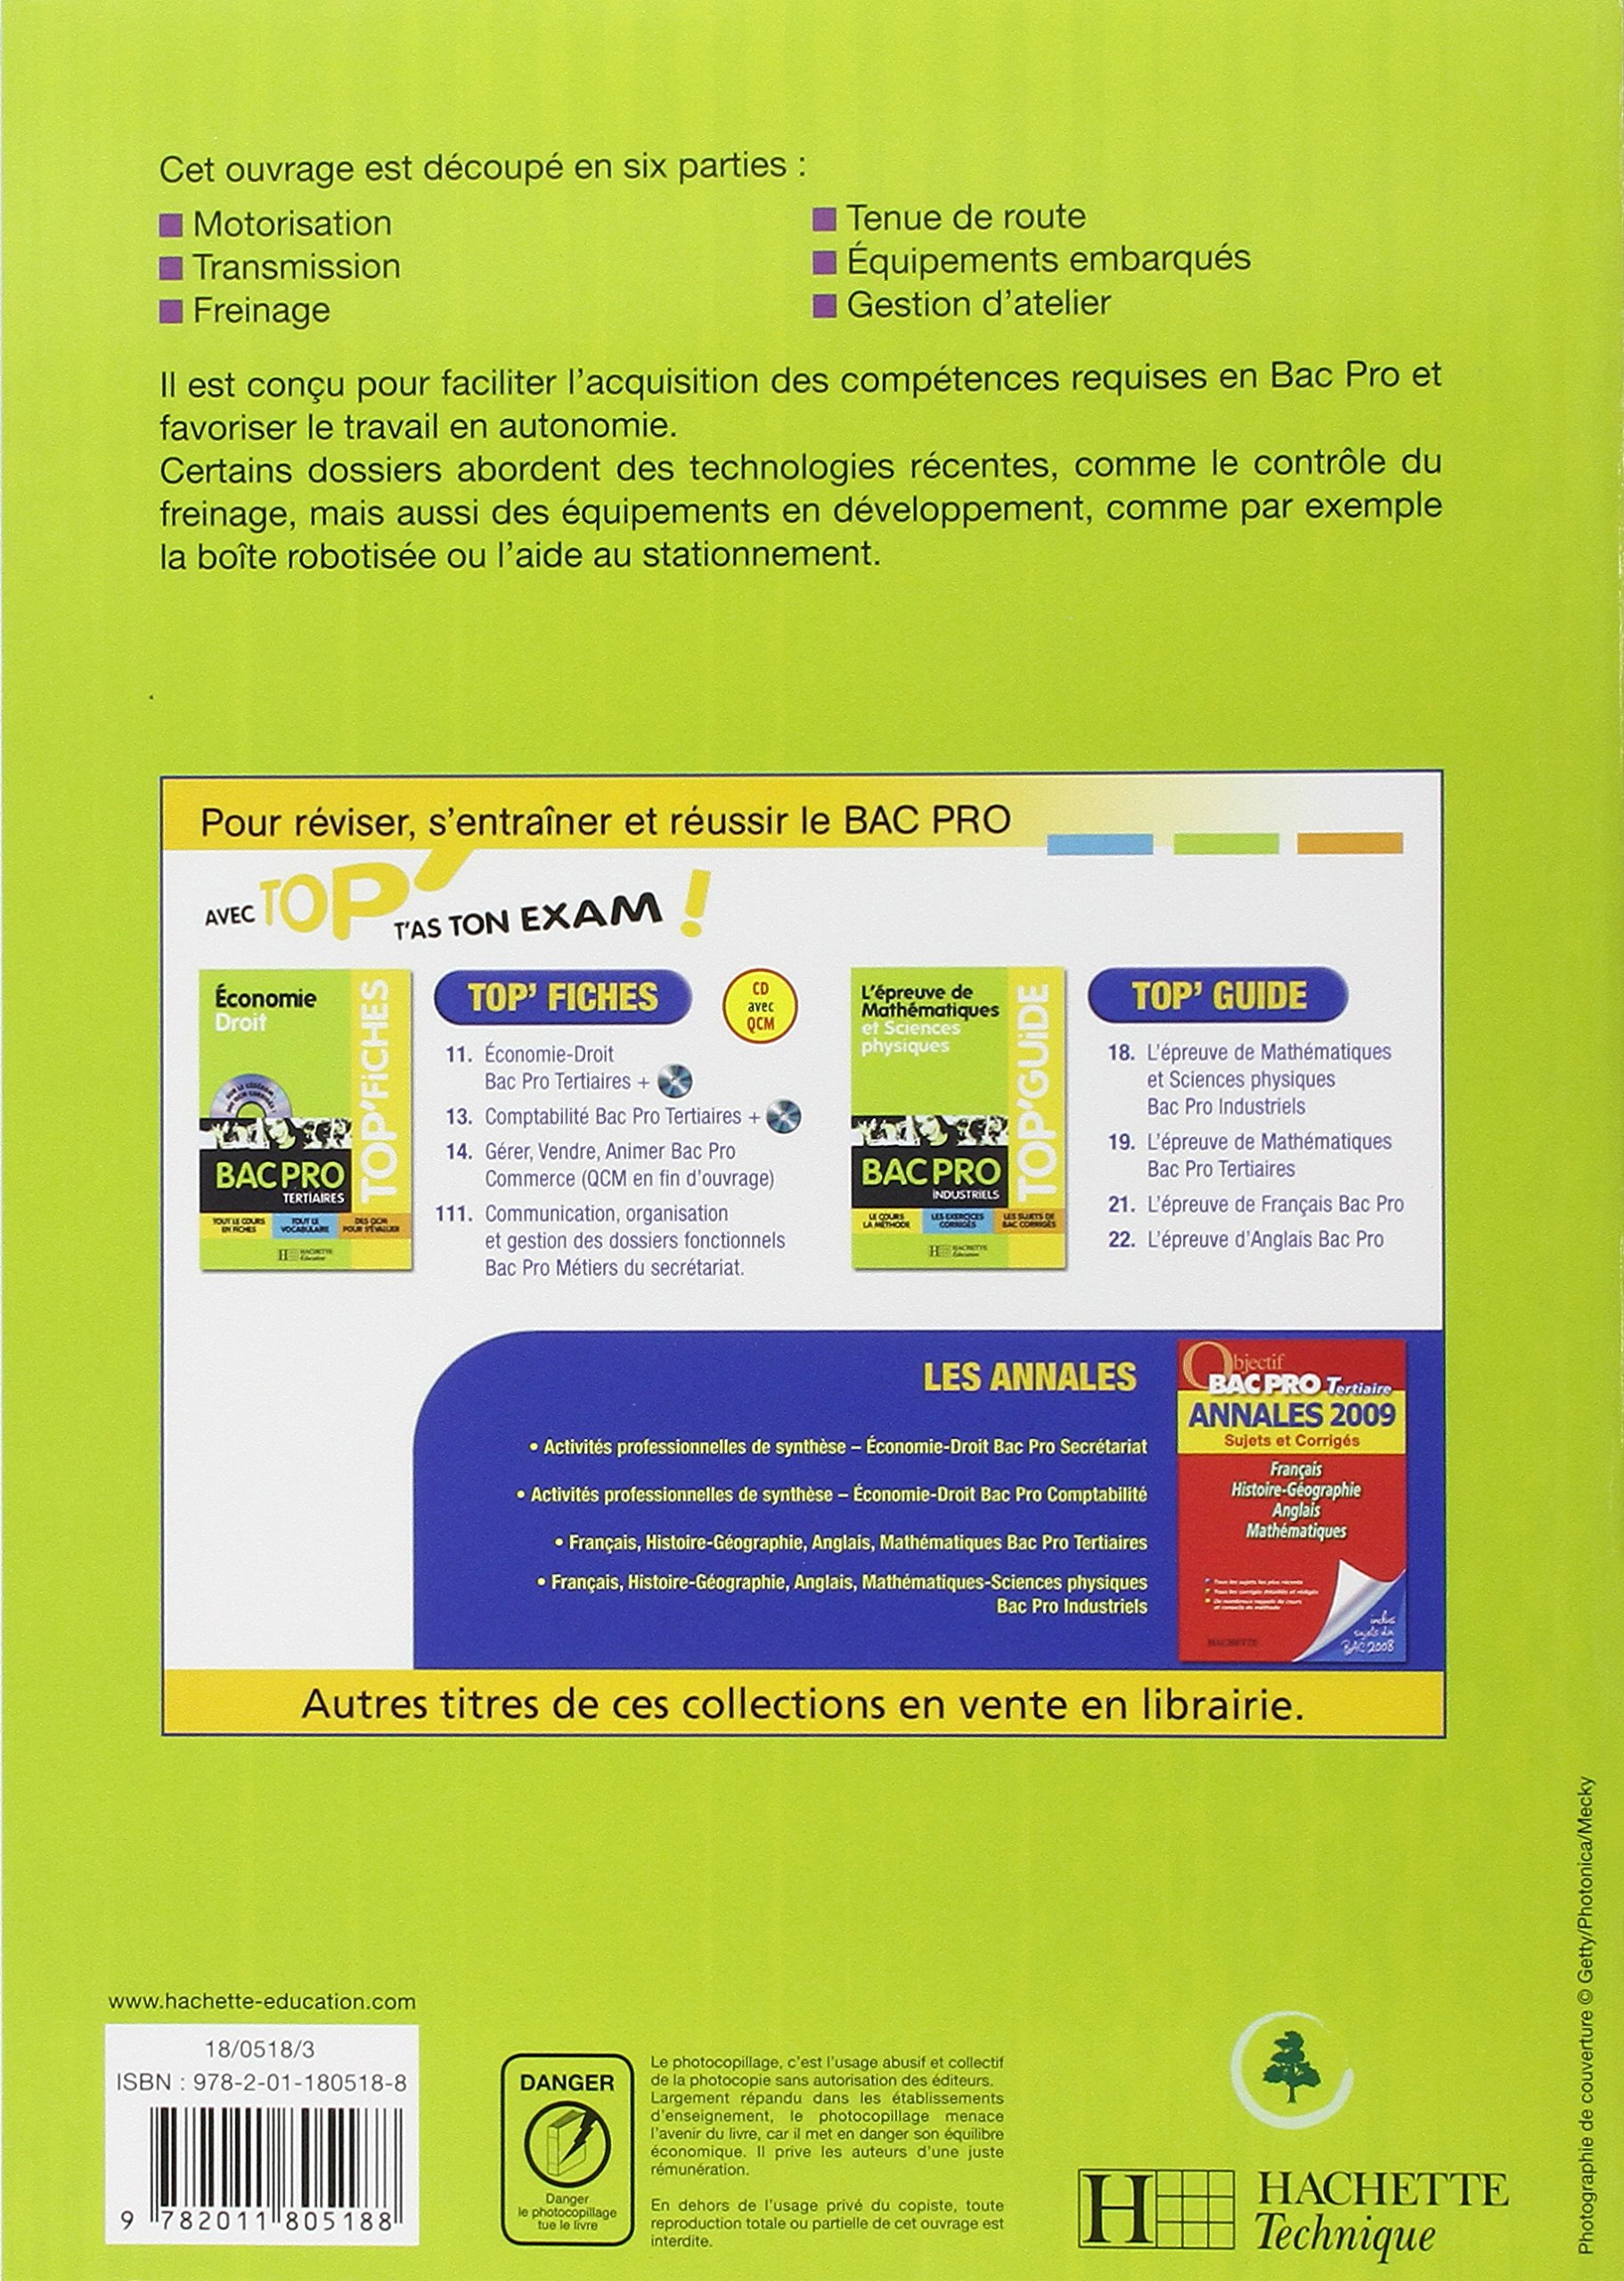 Amazon Fr Maintenance Des Vehicules Automobiles Bac Pro Livre Eleve Ed 2008 Morin Jean Claude Orgaer Christophe Pallenot Fabrice Ruivo Philippe Livres